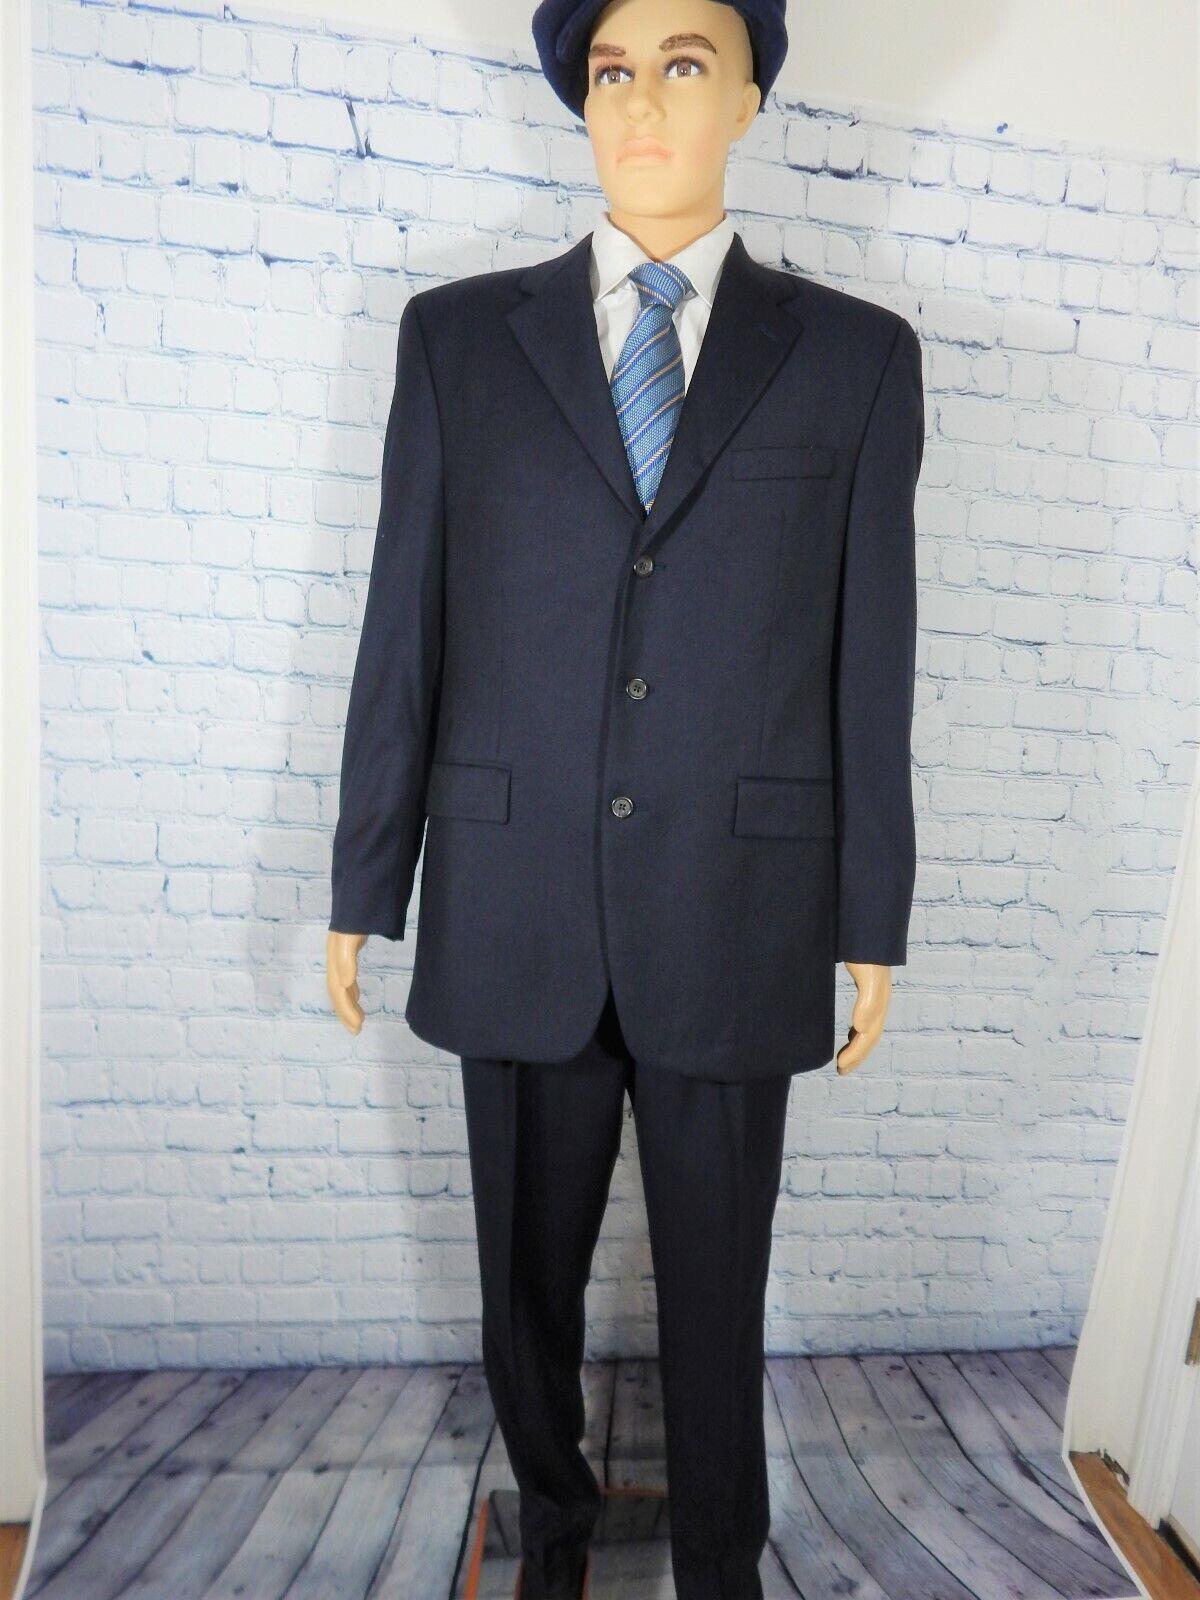 Men's Navy bluee 3 Button Executive Suit,RALPH LAUREN,Cuffed&pleatd,42L-38x30 NIC